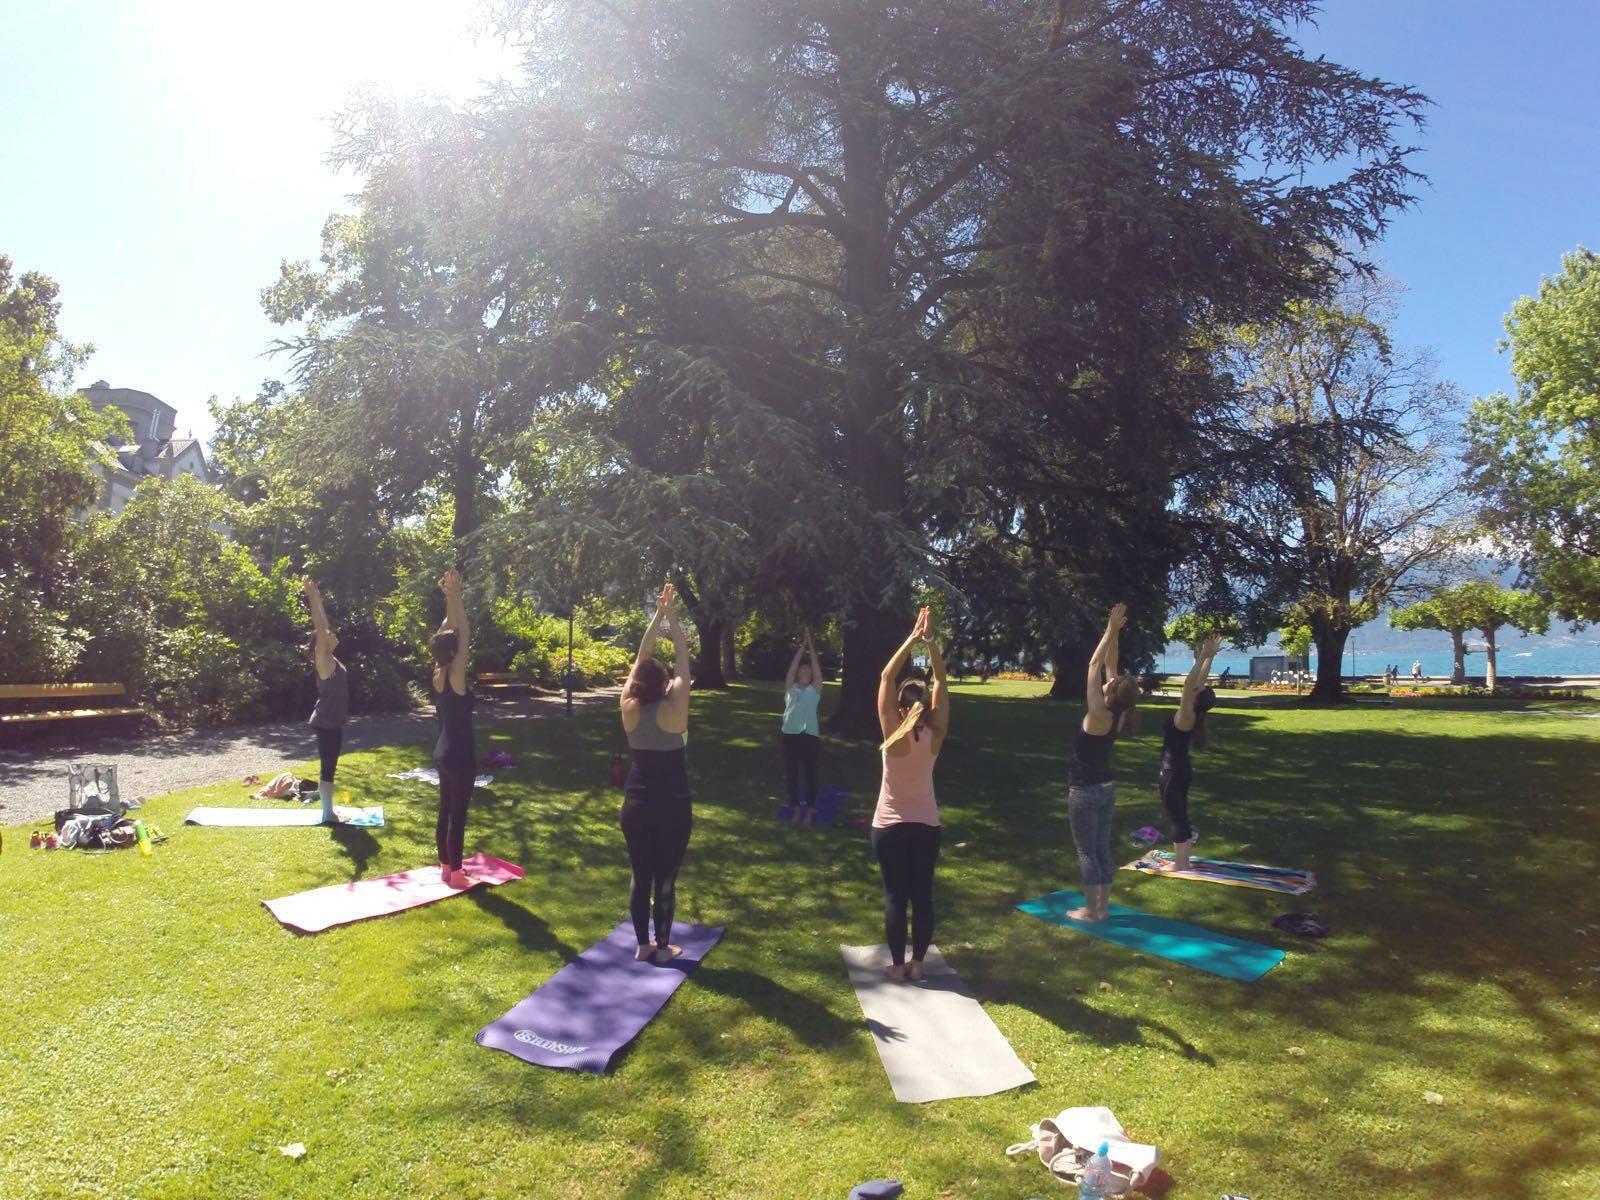 25.04.21 - Hatha Yoga au Parc Roussy